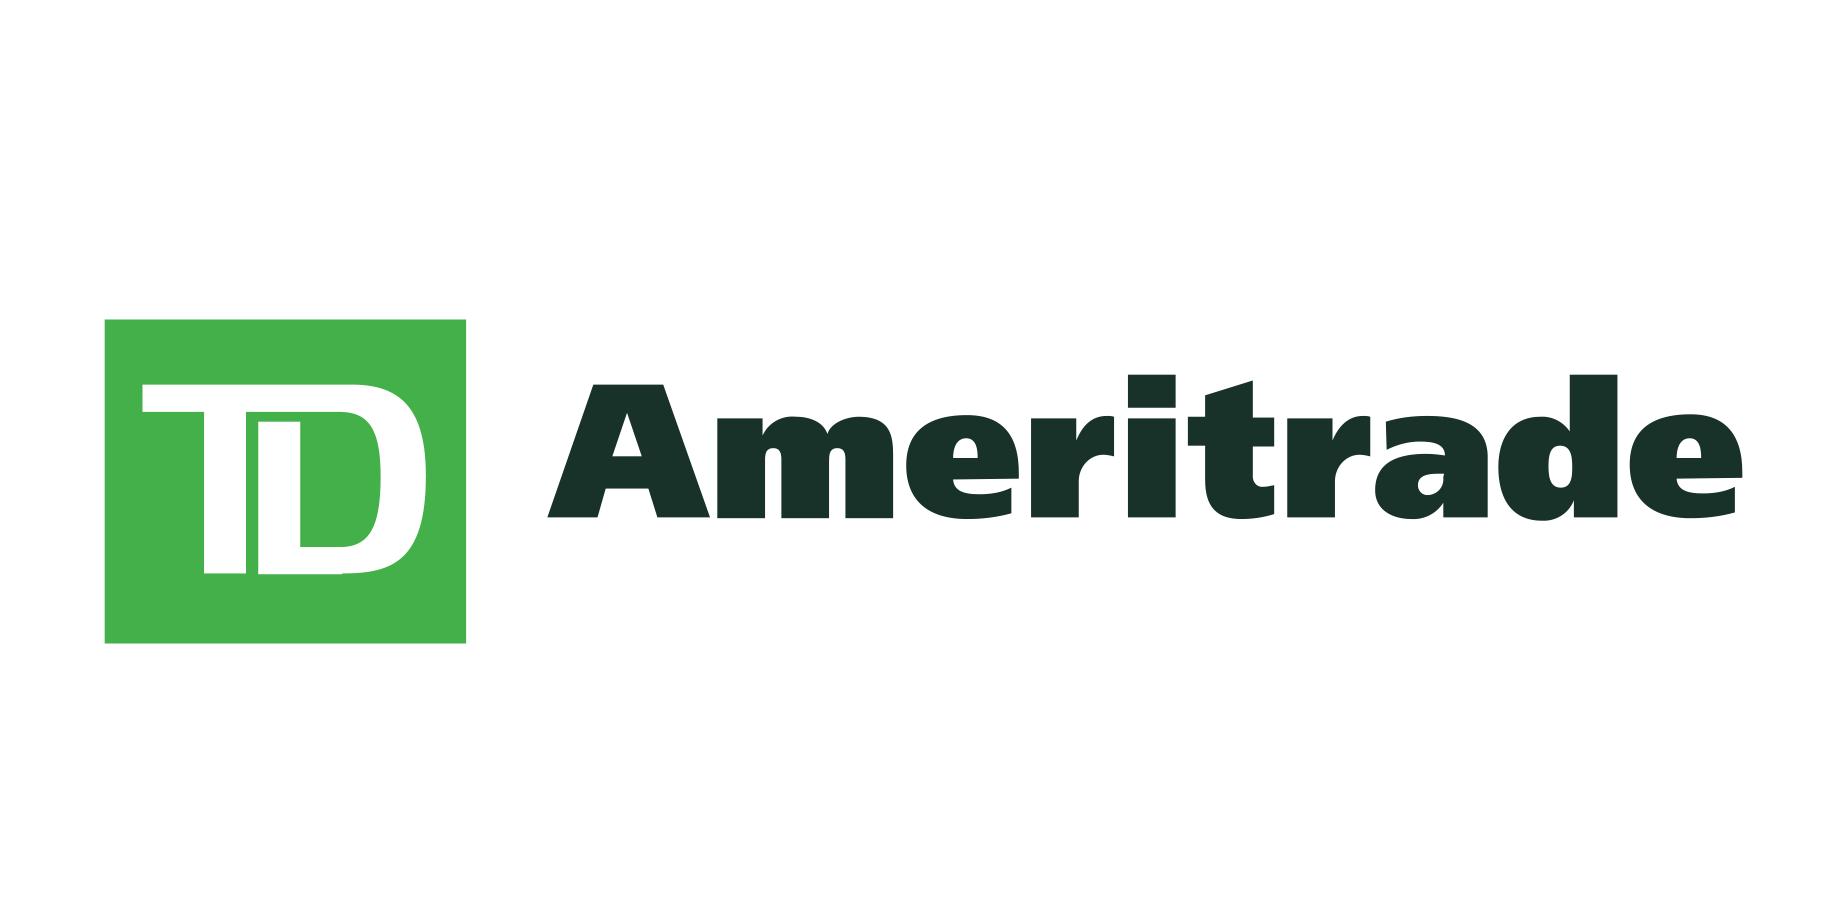 TD Ameritrade Middleton, MA Tapparo Capital Management